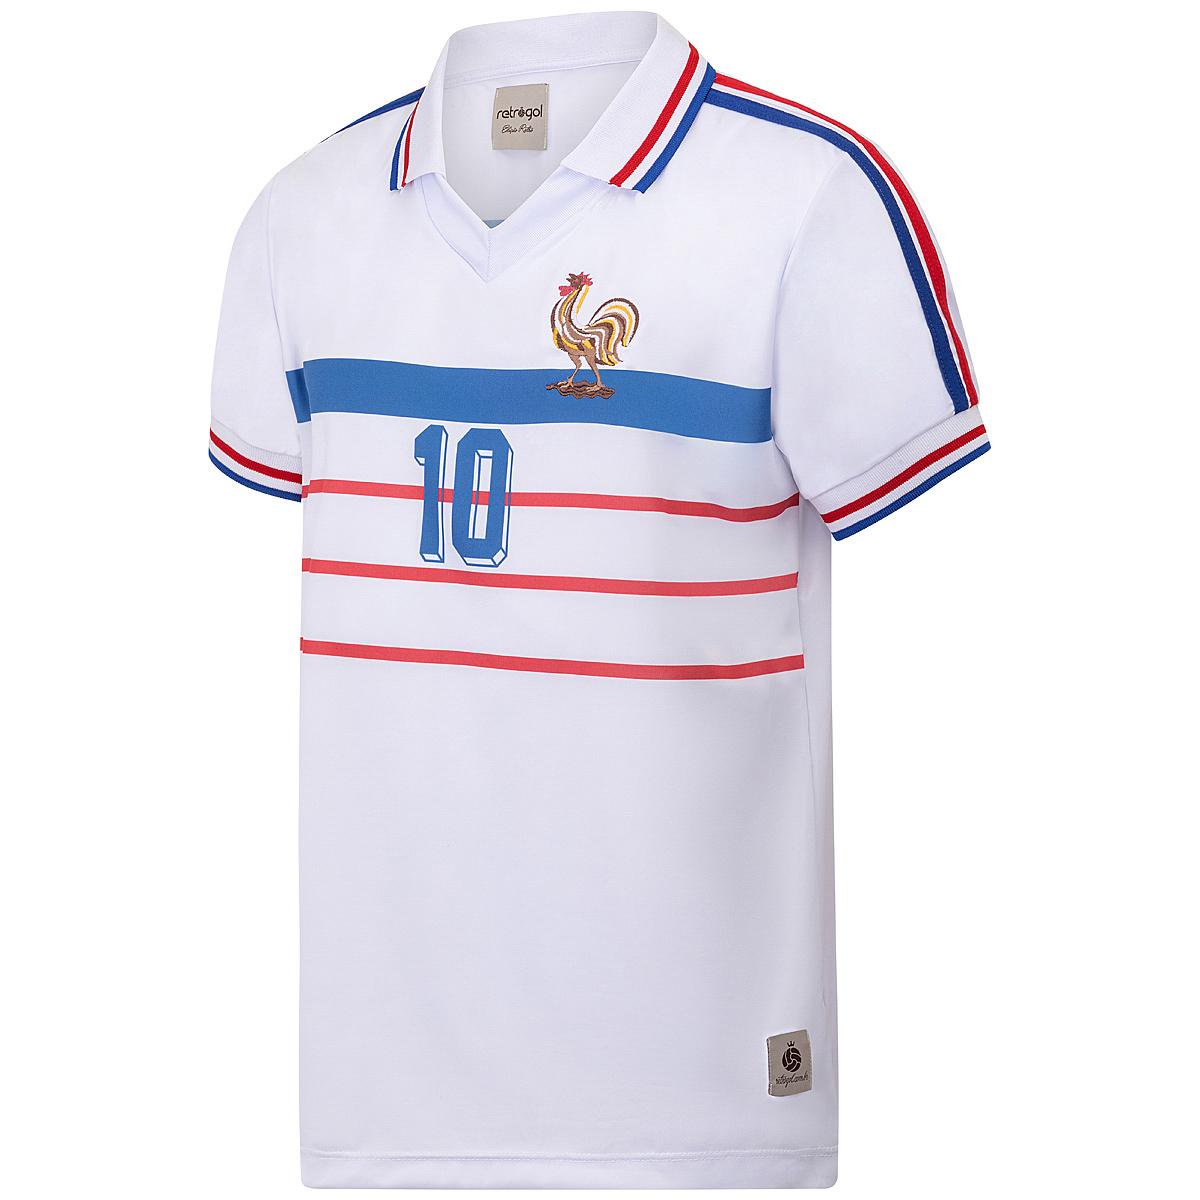 Camisa França Retrô 1998 Away Masculina